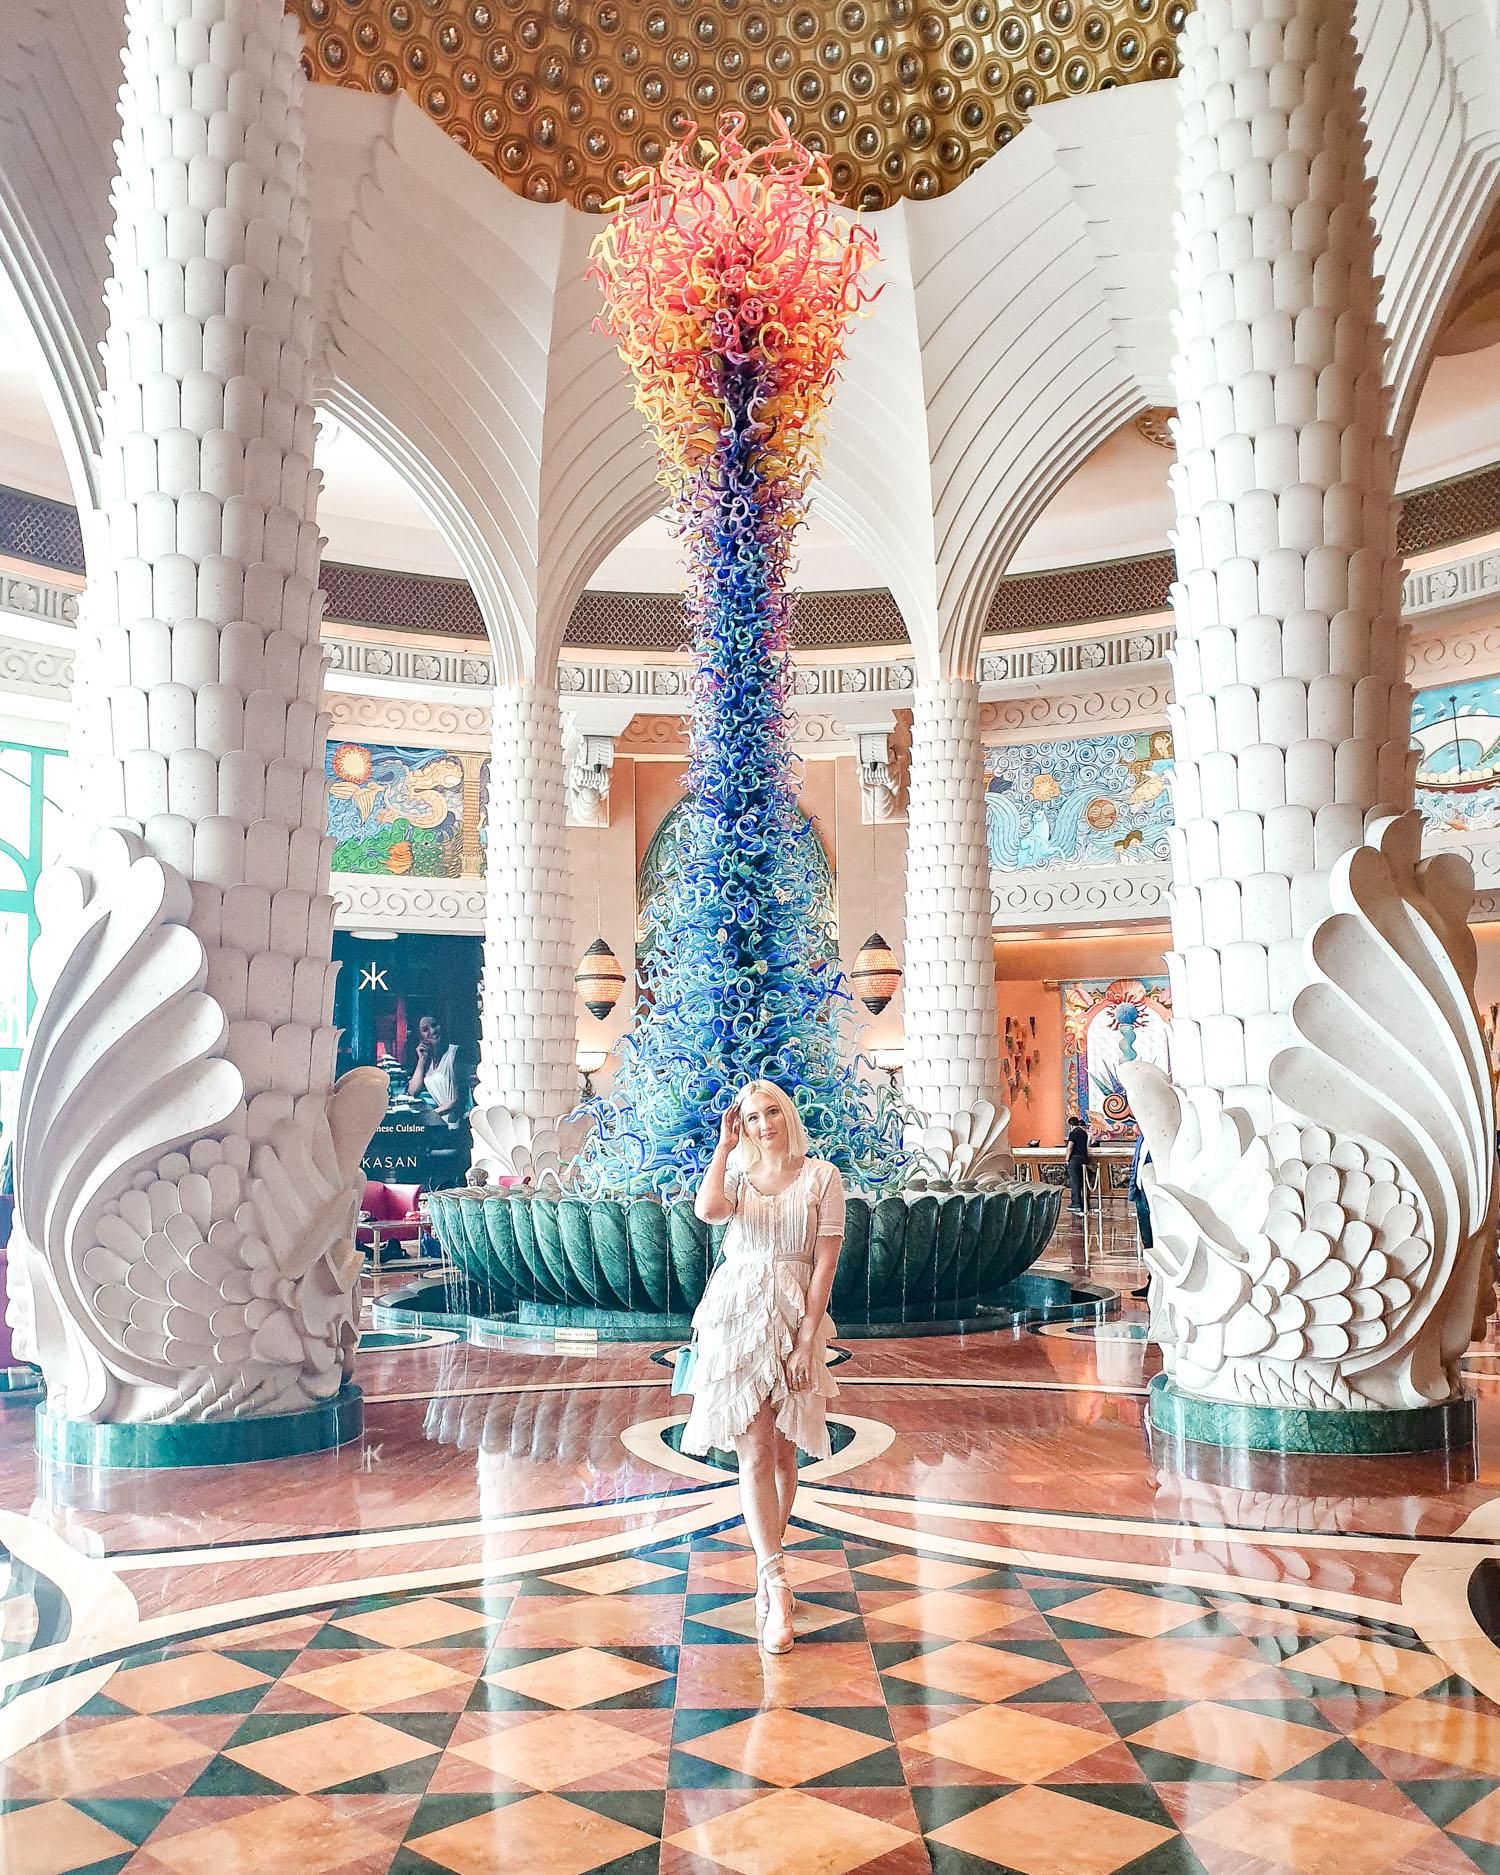 The Atlantis hotel lobby